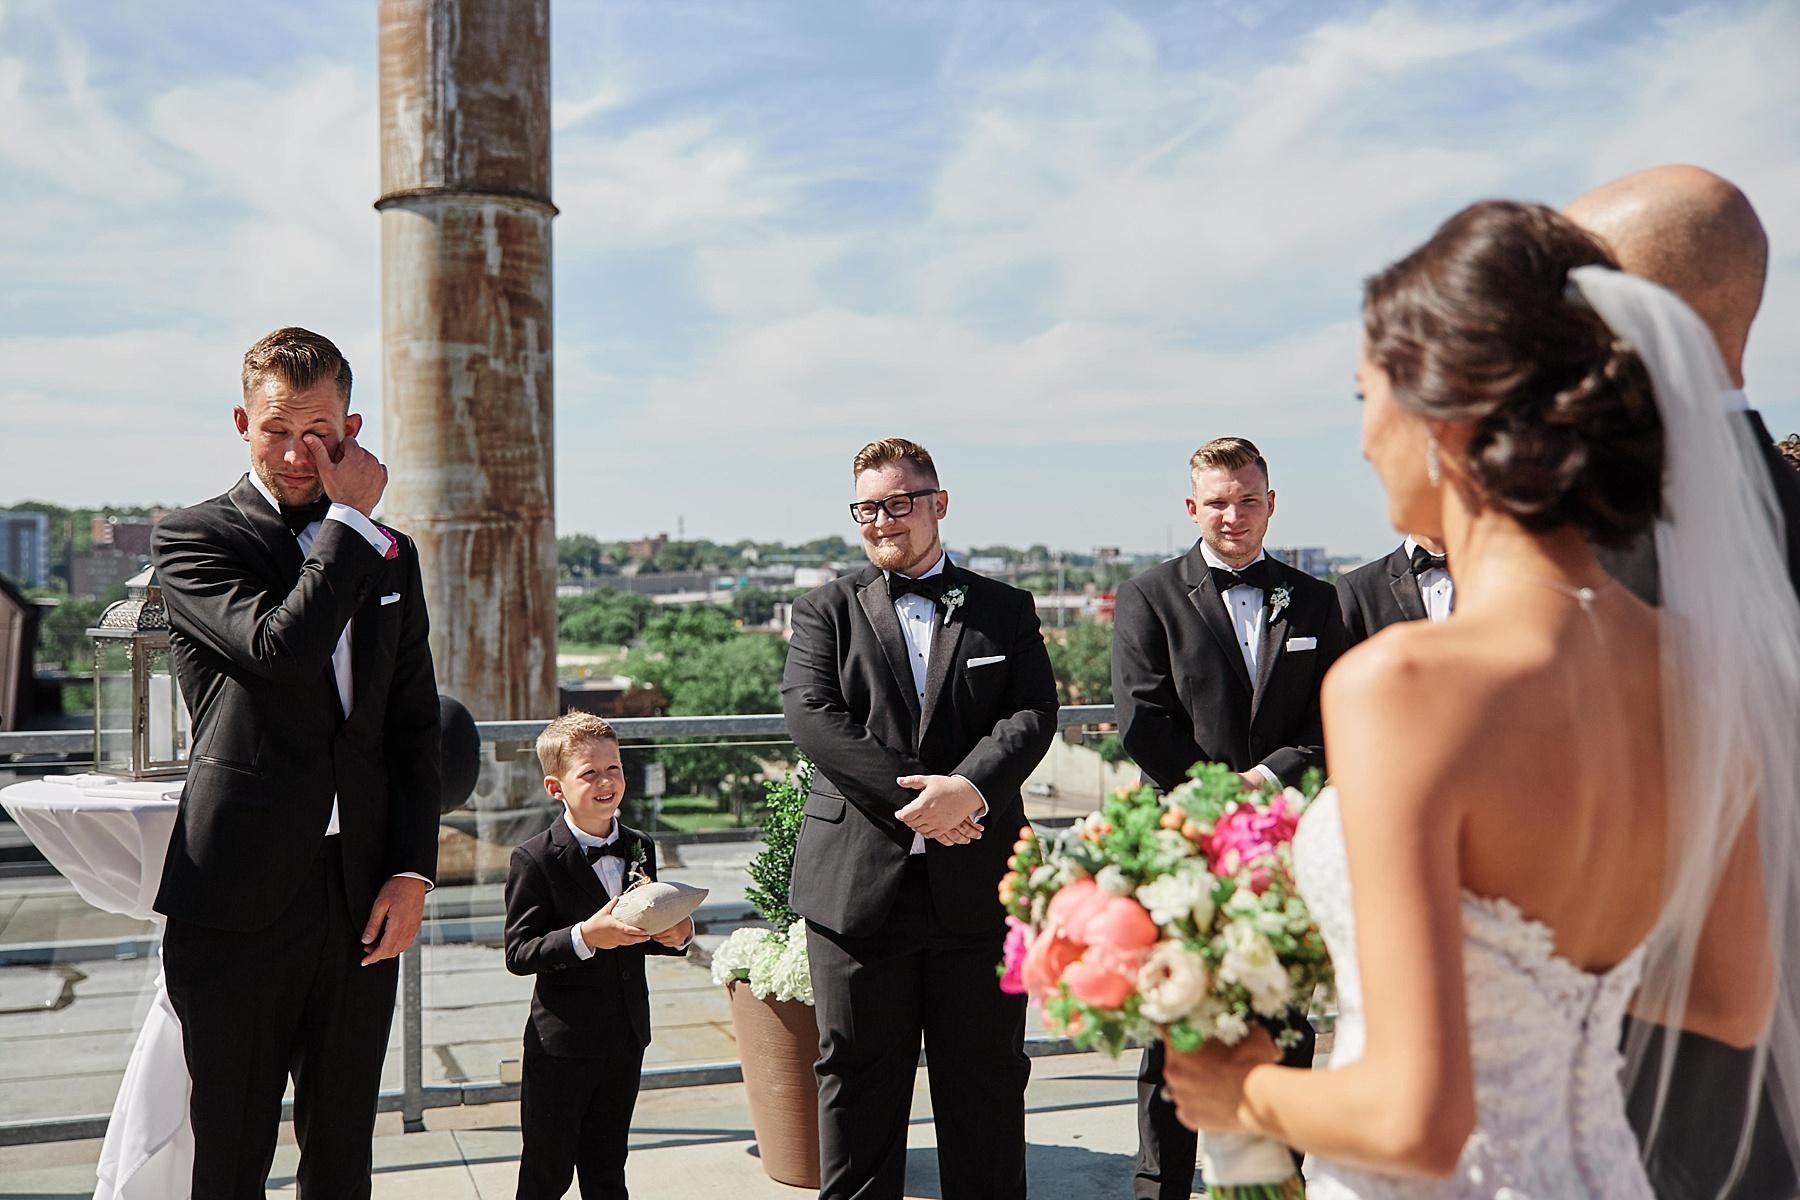 ABULAE-Wedding-Saint-paul-MN-Josh-Sofia-Wedding-Mears-Park_0755.jpg